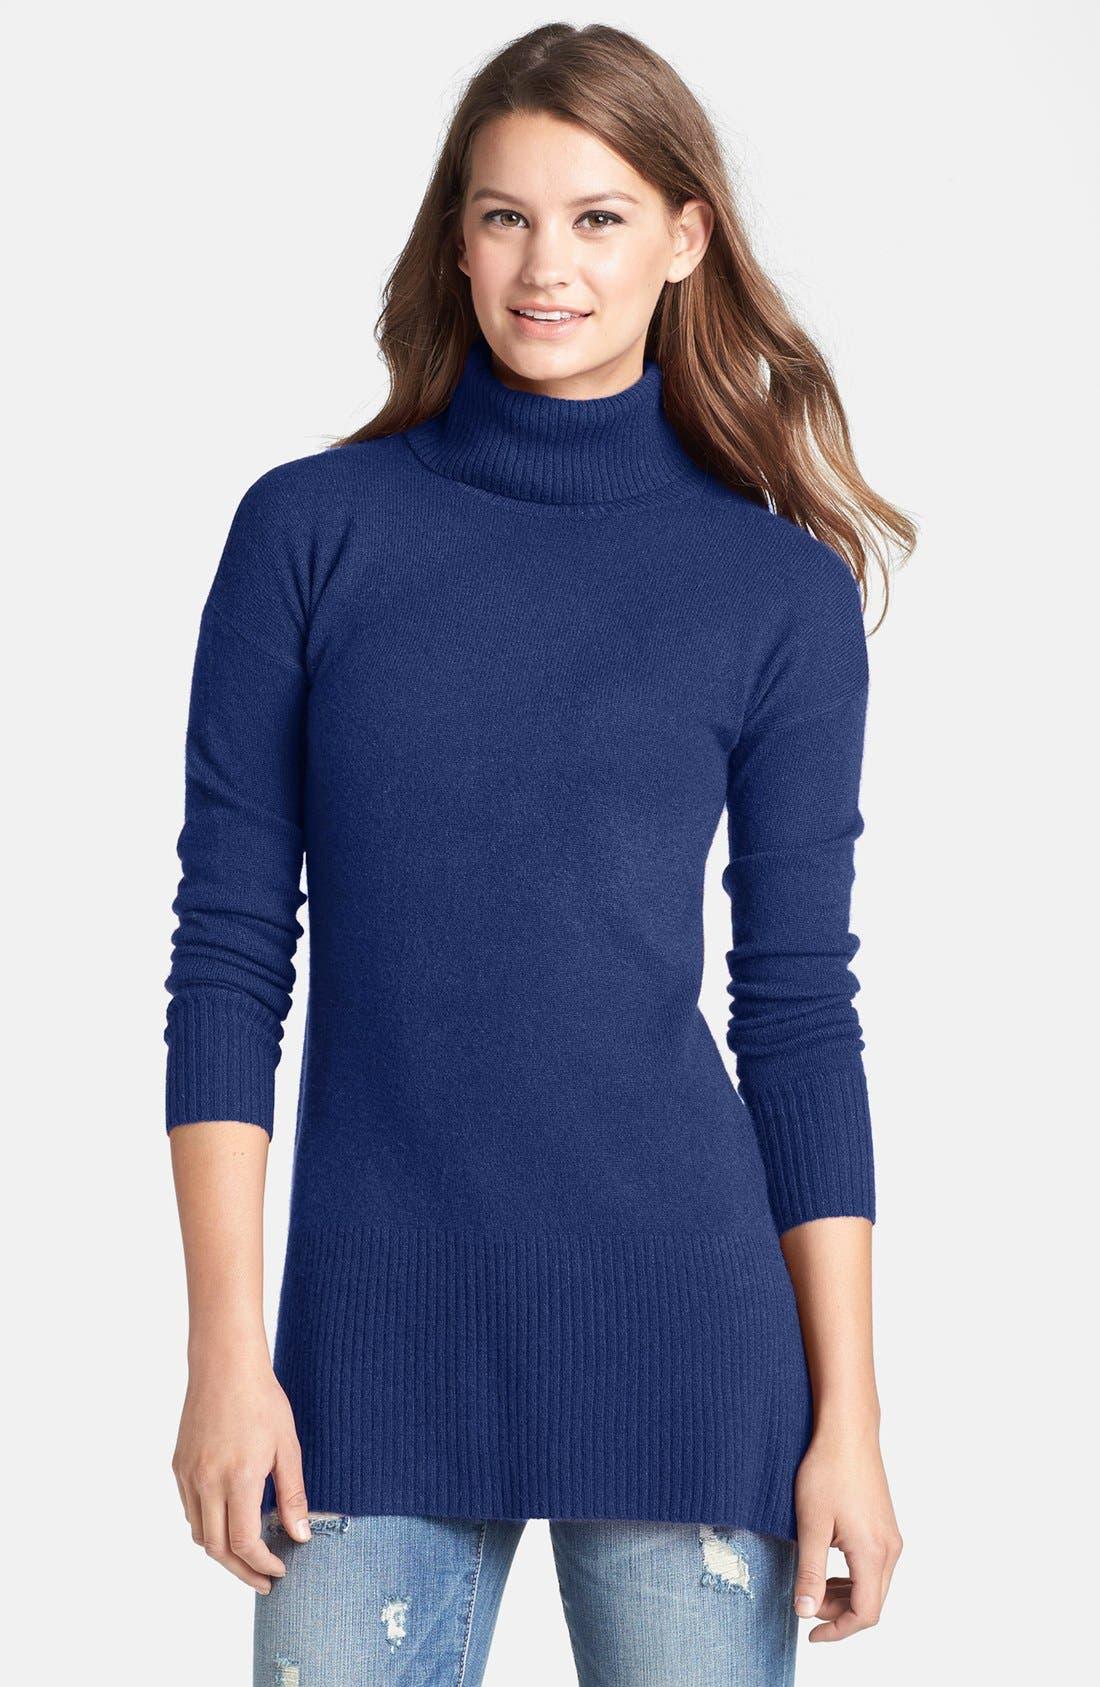 Alternate Image 1 Selected - Caslon® Cashmere Turtleneck Sweater